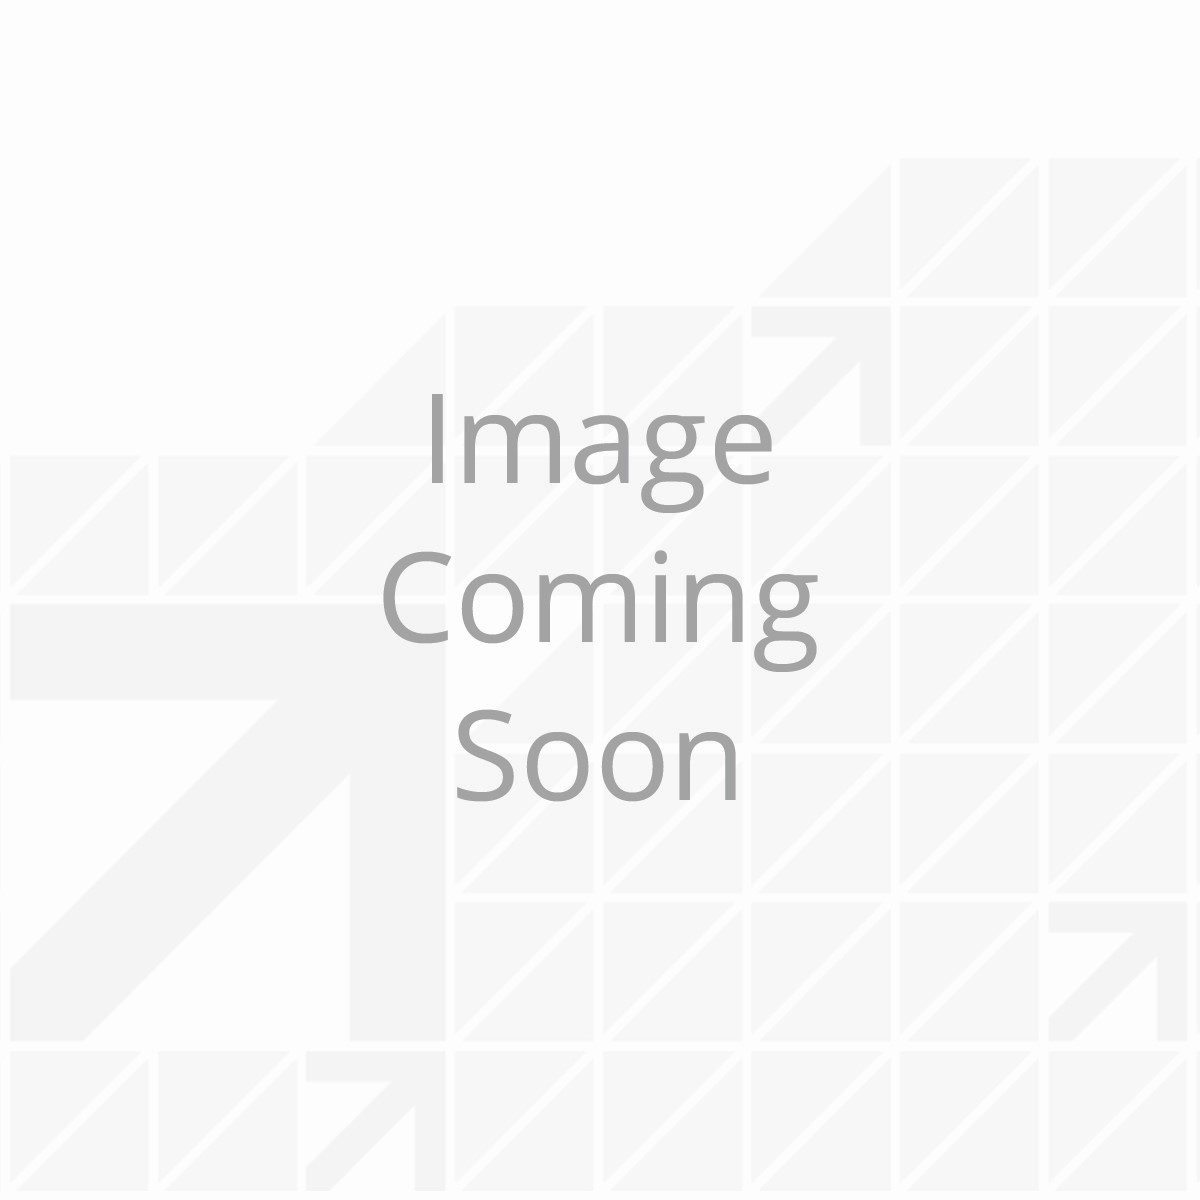 349975_-_jack_bracket_-_001